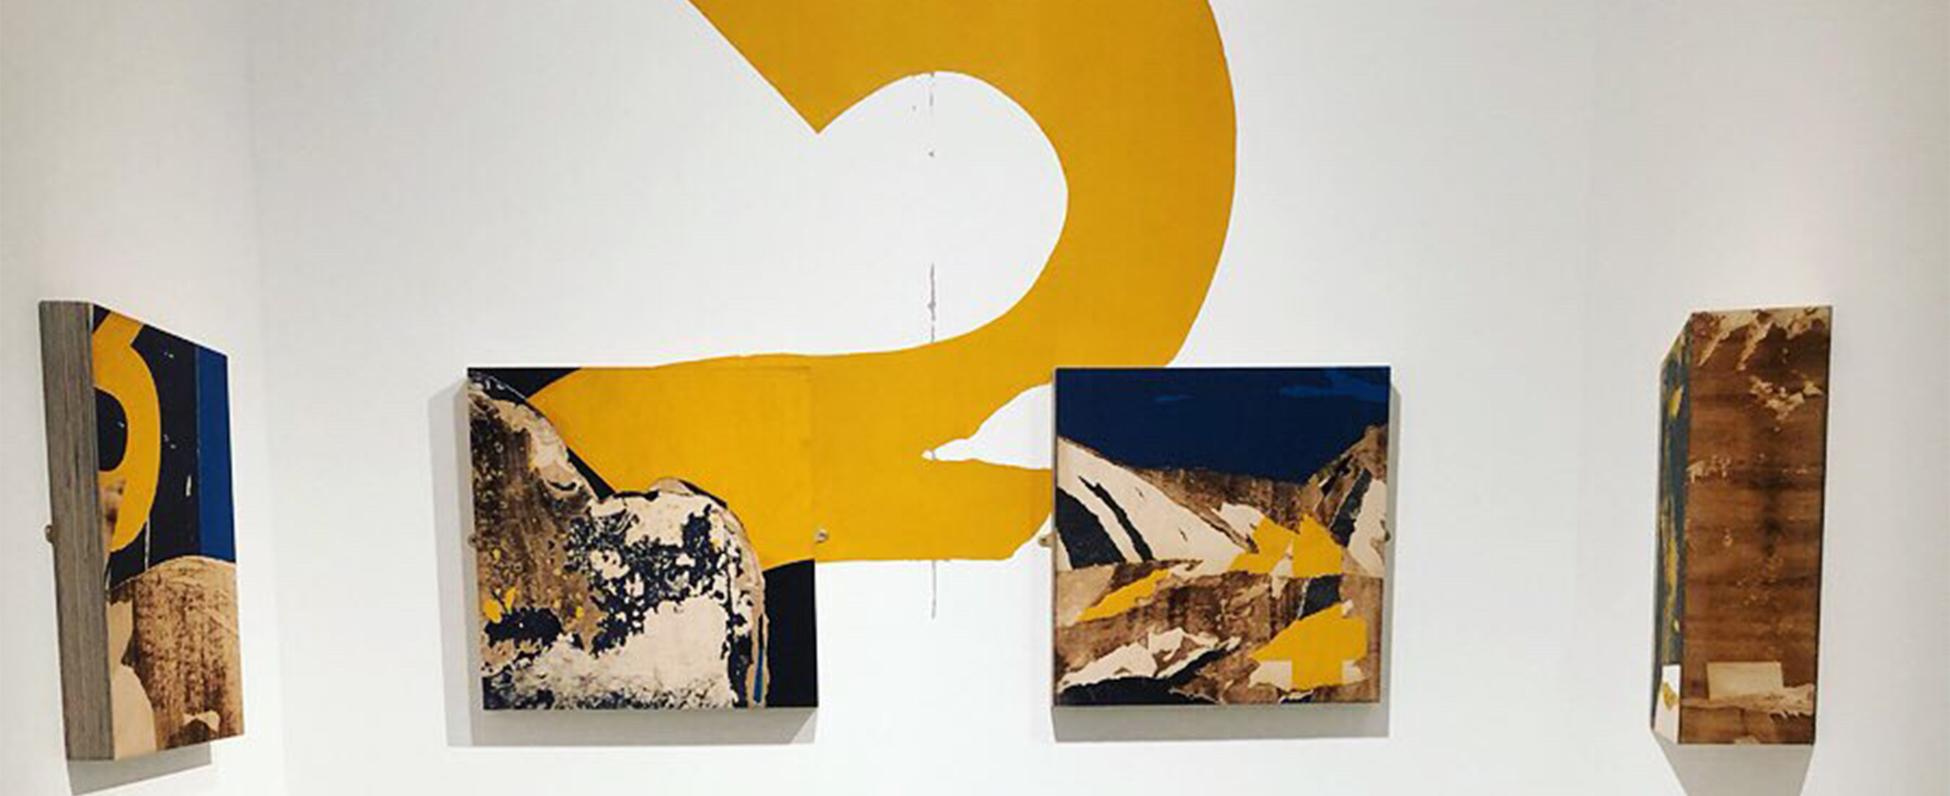 Exhibitions - RESIDENCIES & AWARDS